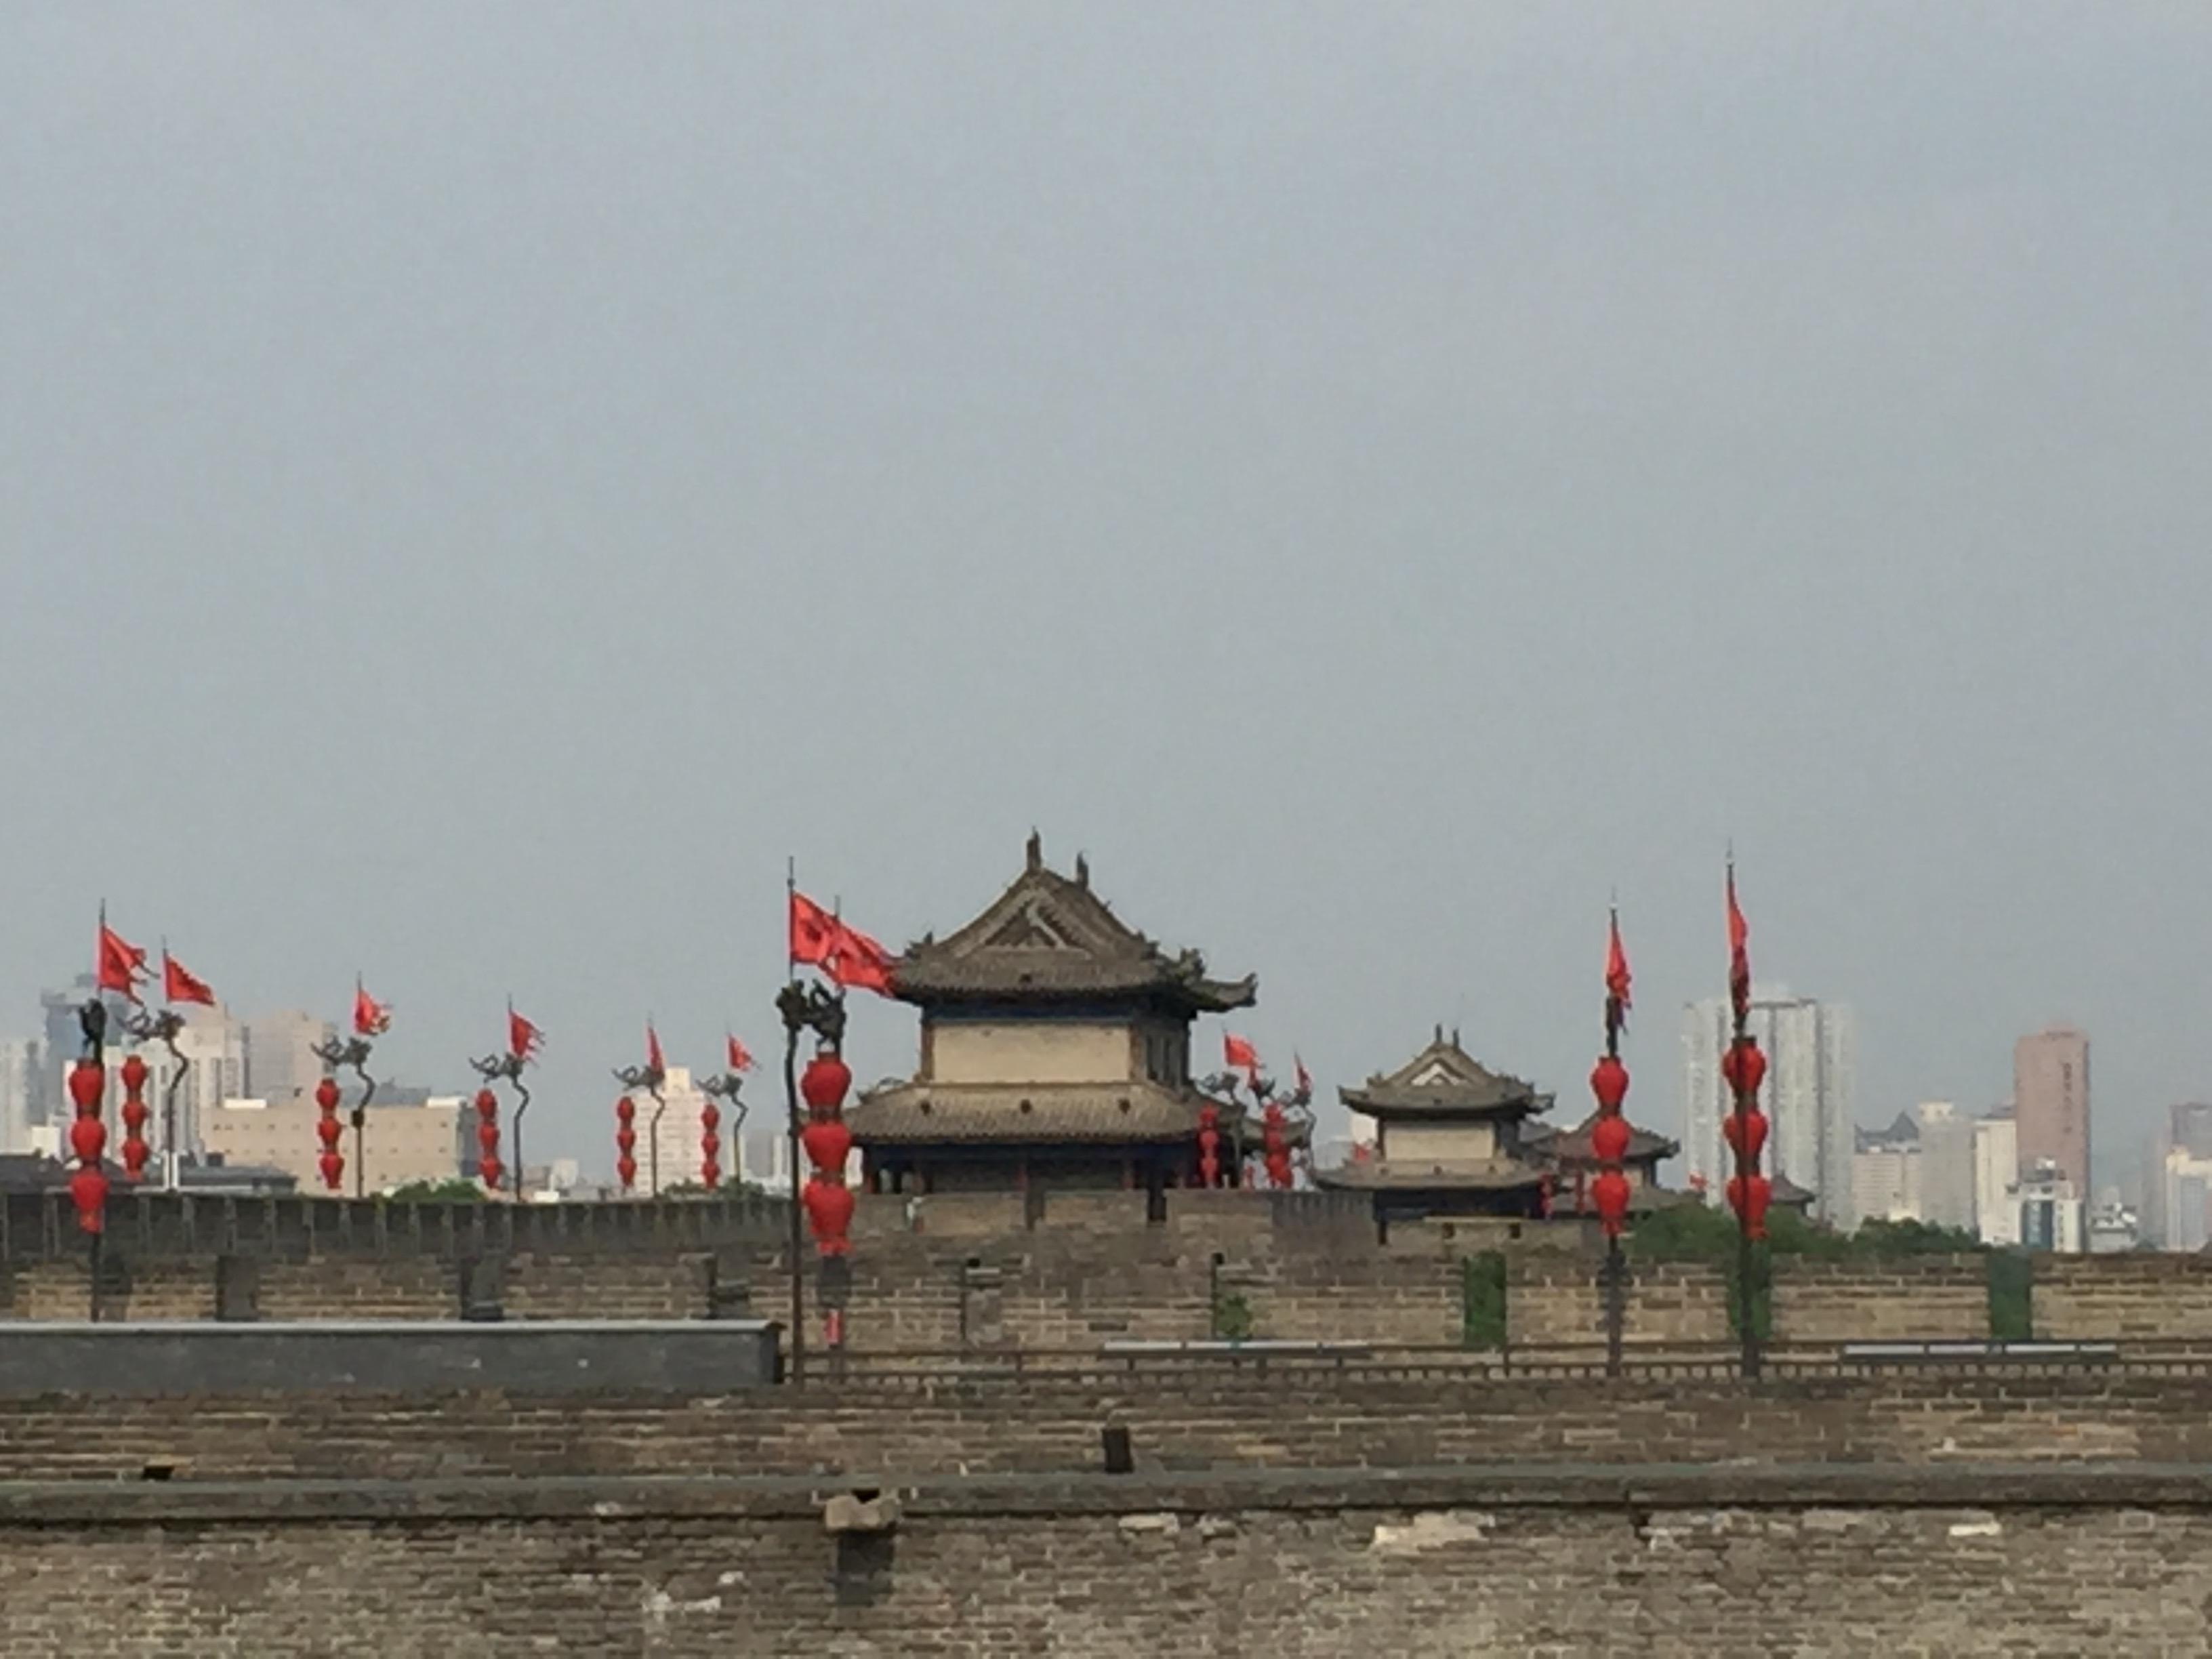 Xi'an city's walls